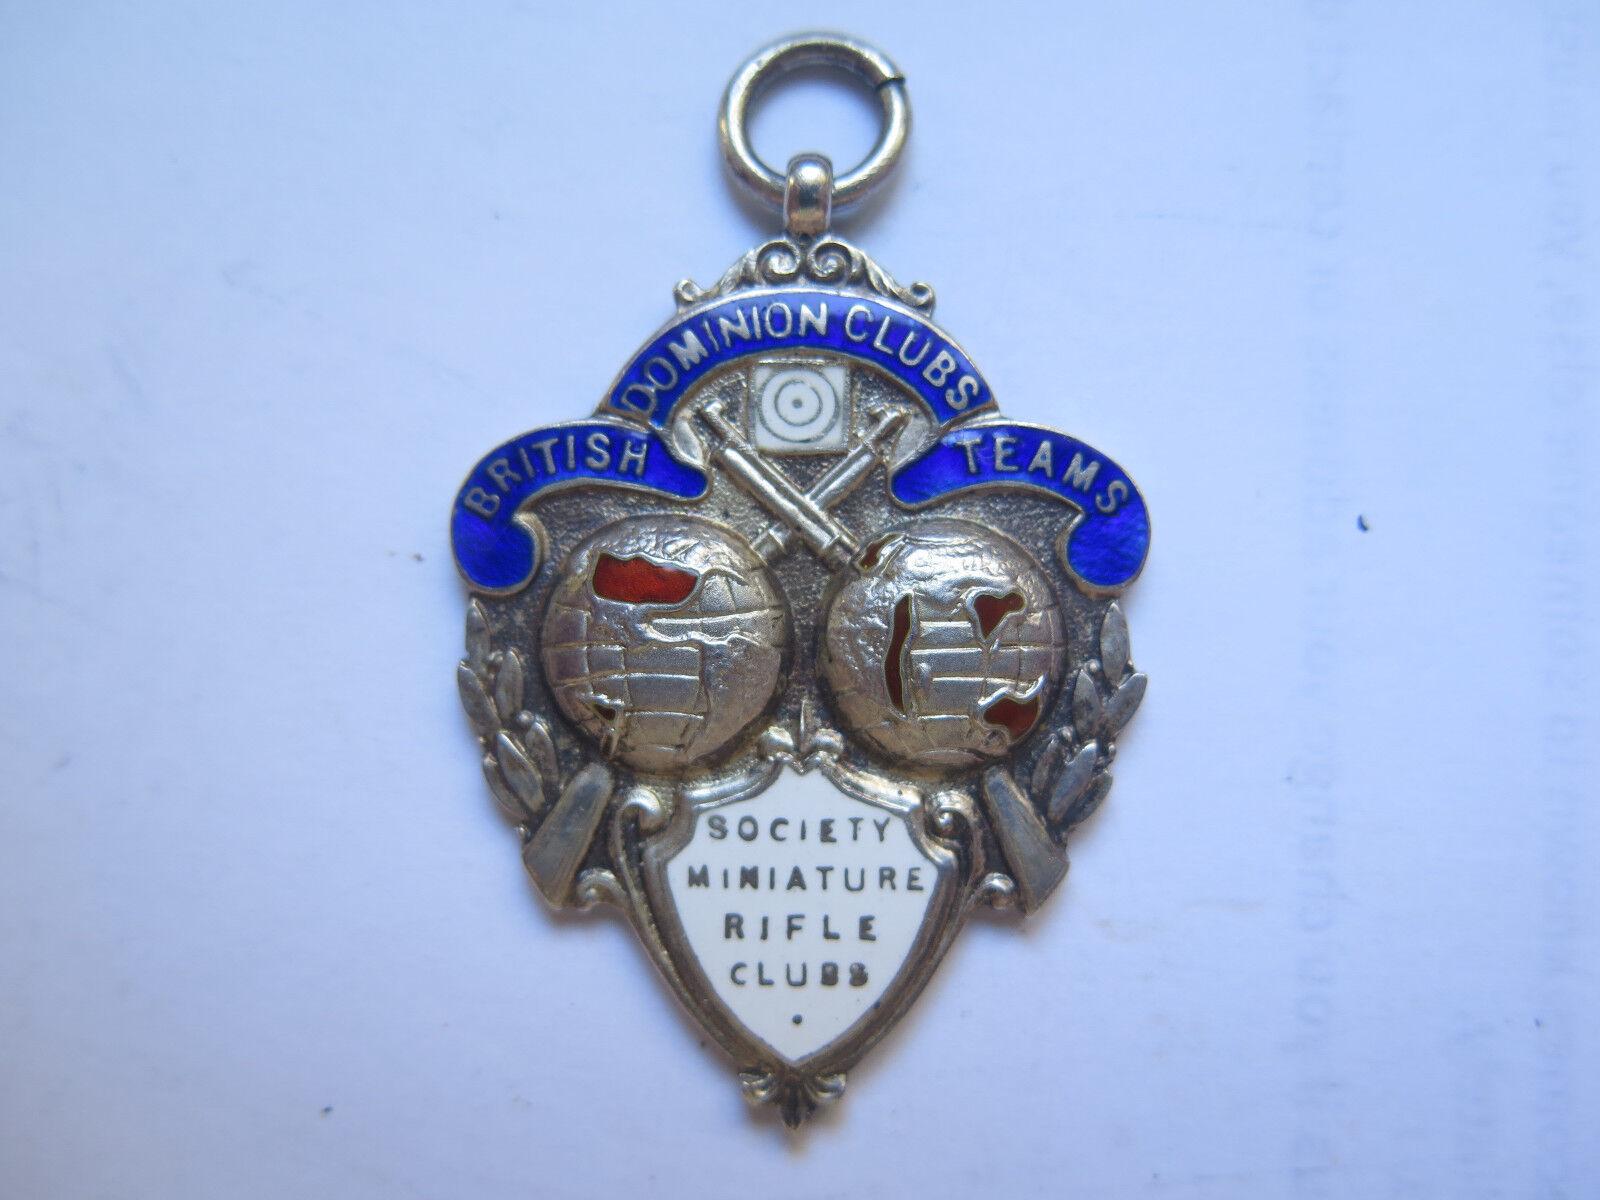 1932 equipos clubes británicos Dominion sociedad Miniatura rifle clubes Stg Sil medalla